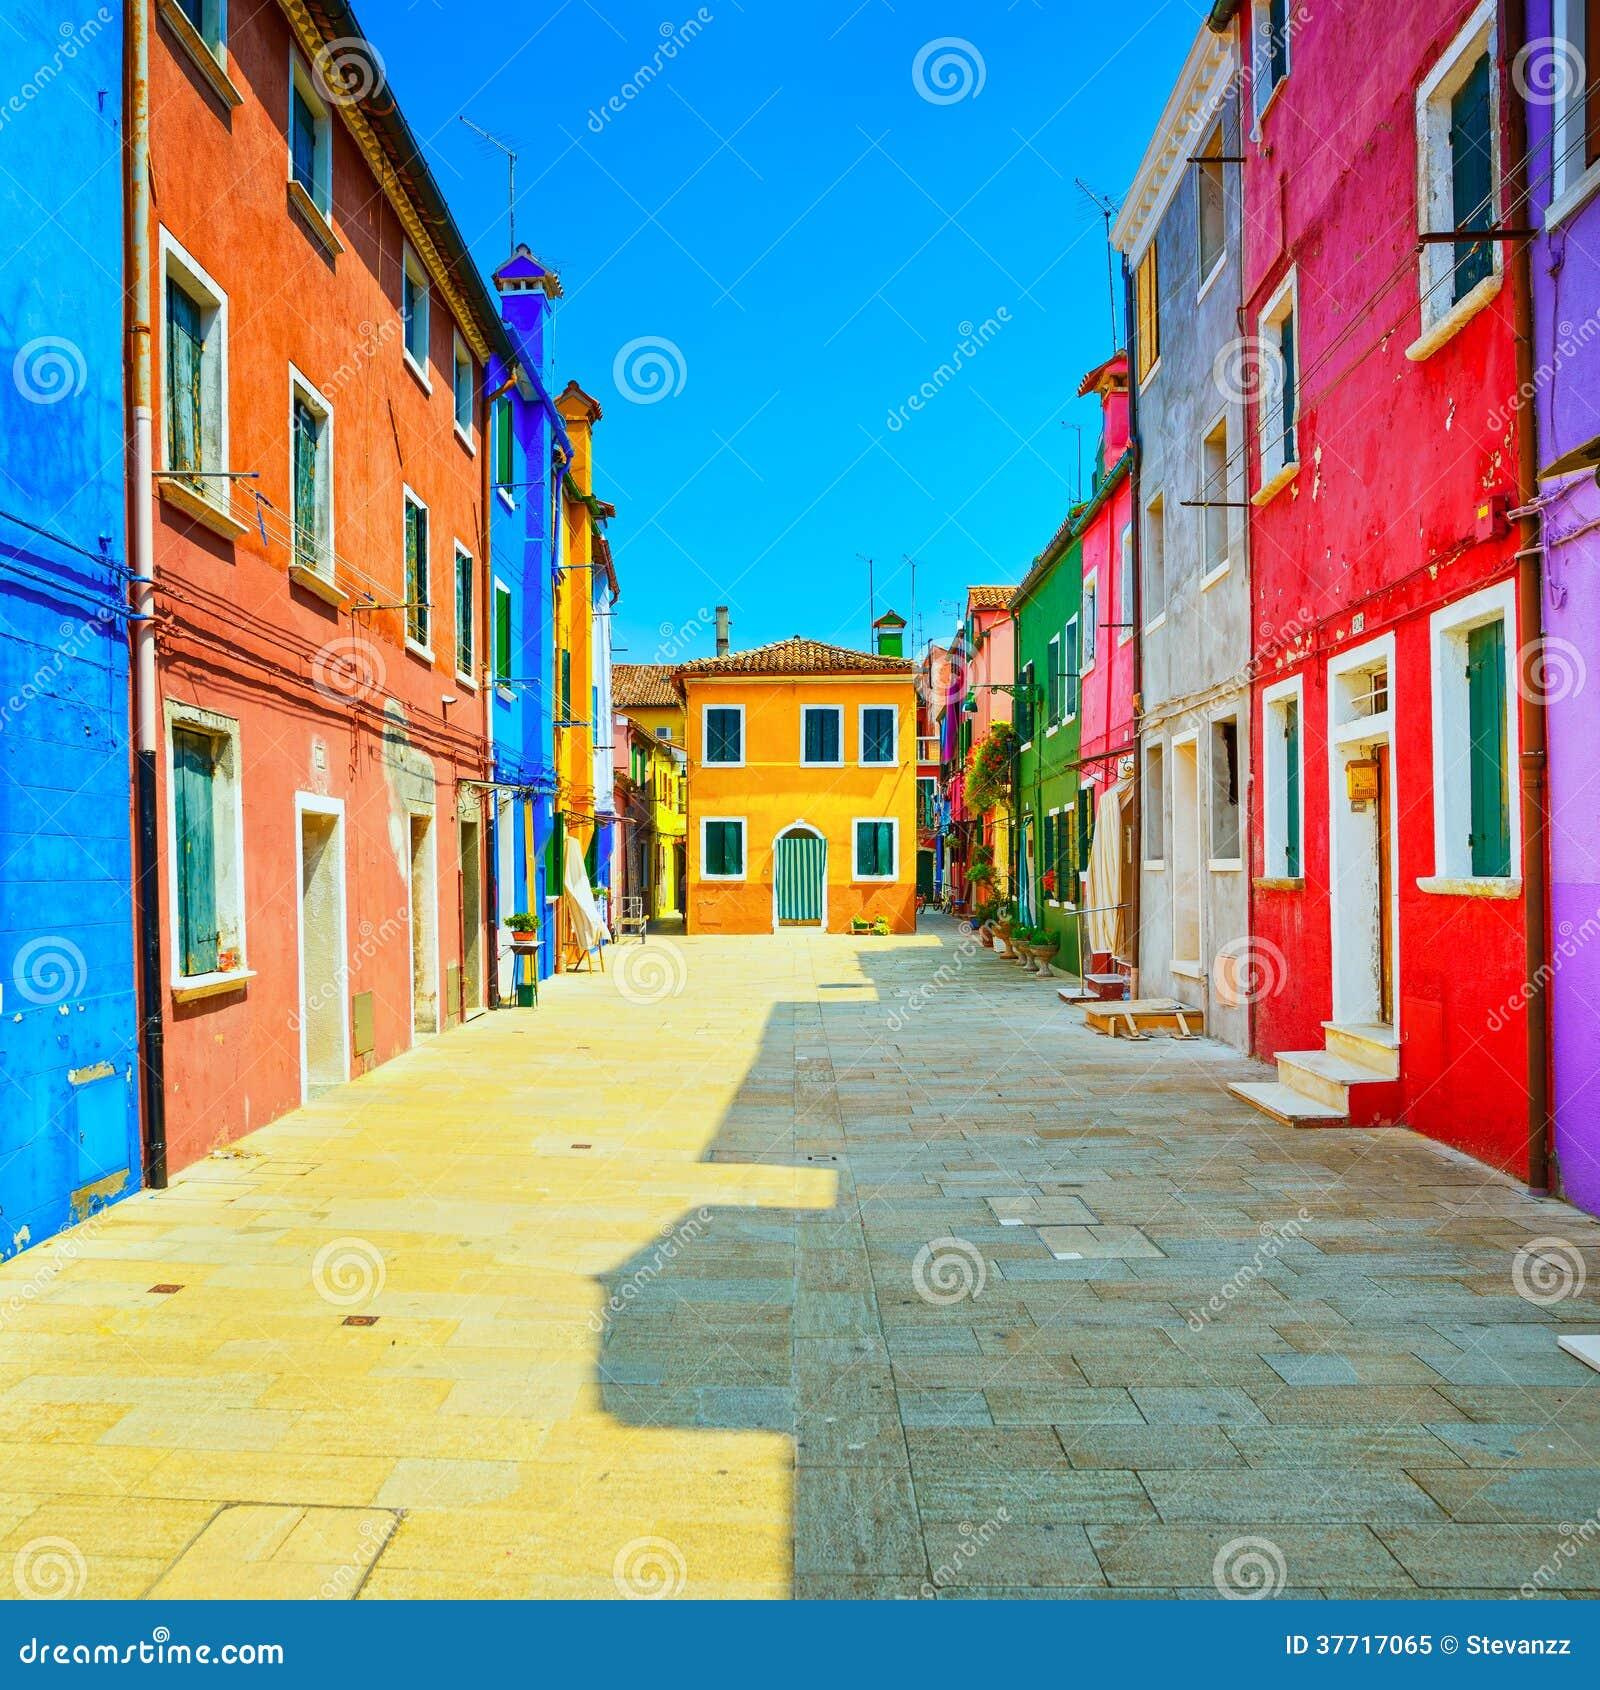 Venice Landmark, Burano Island Street, Colorful Houses ...